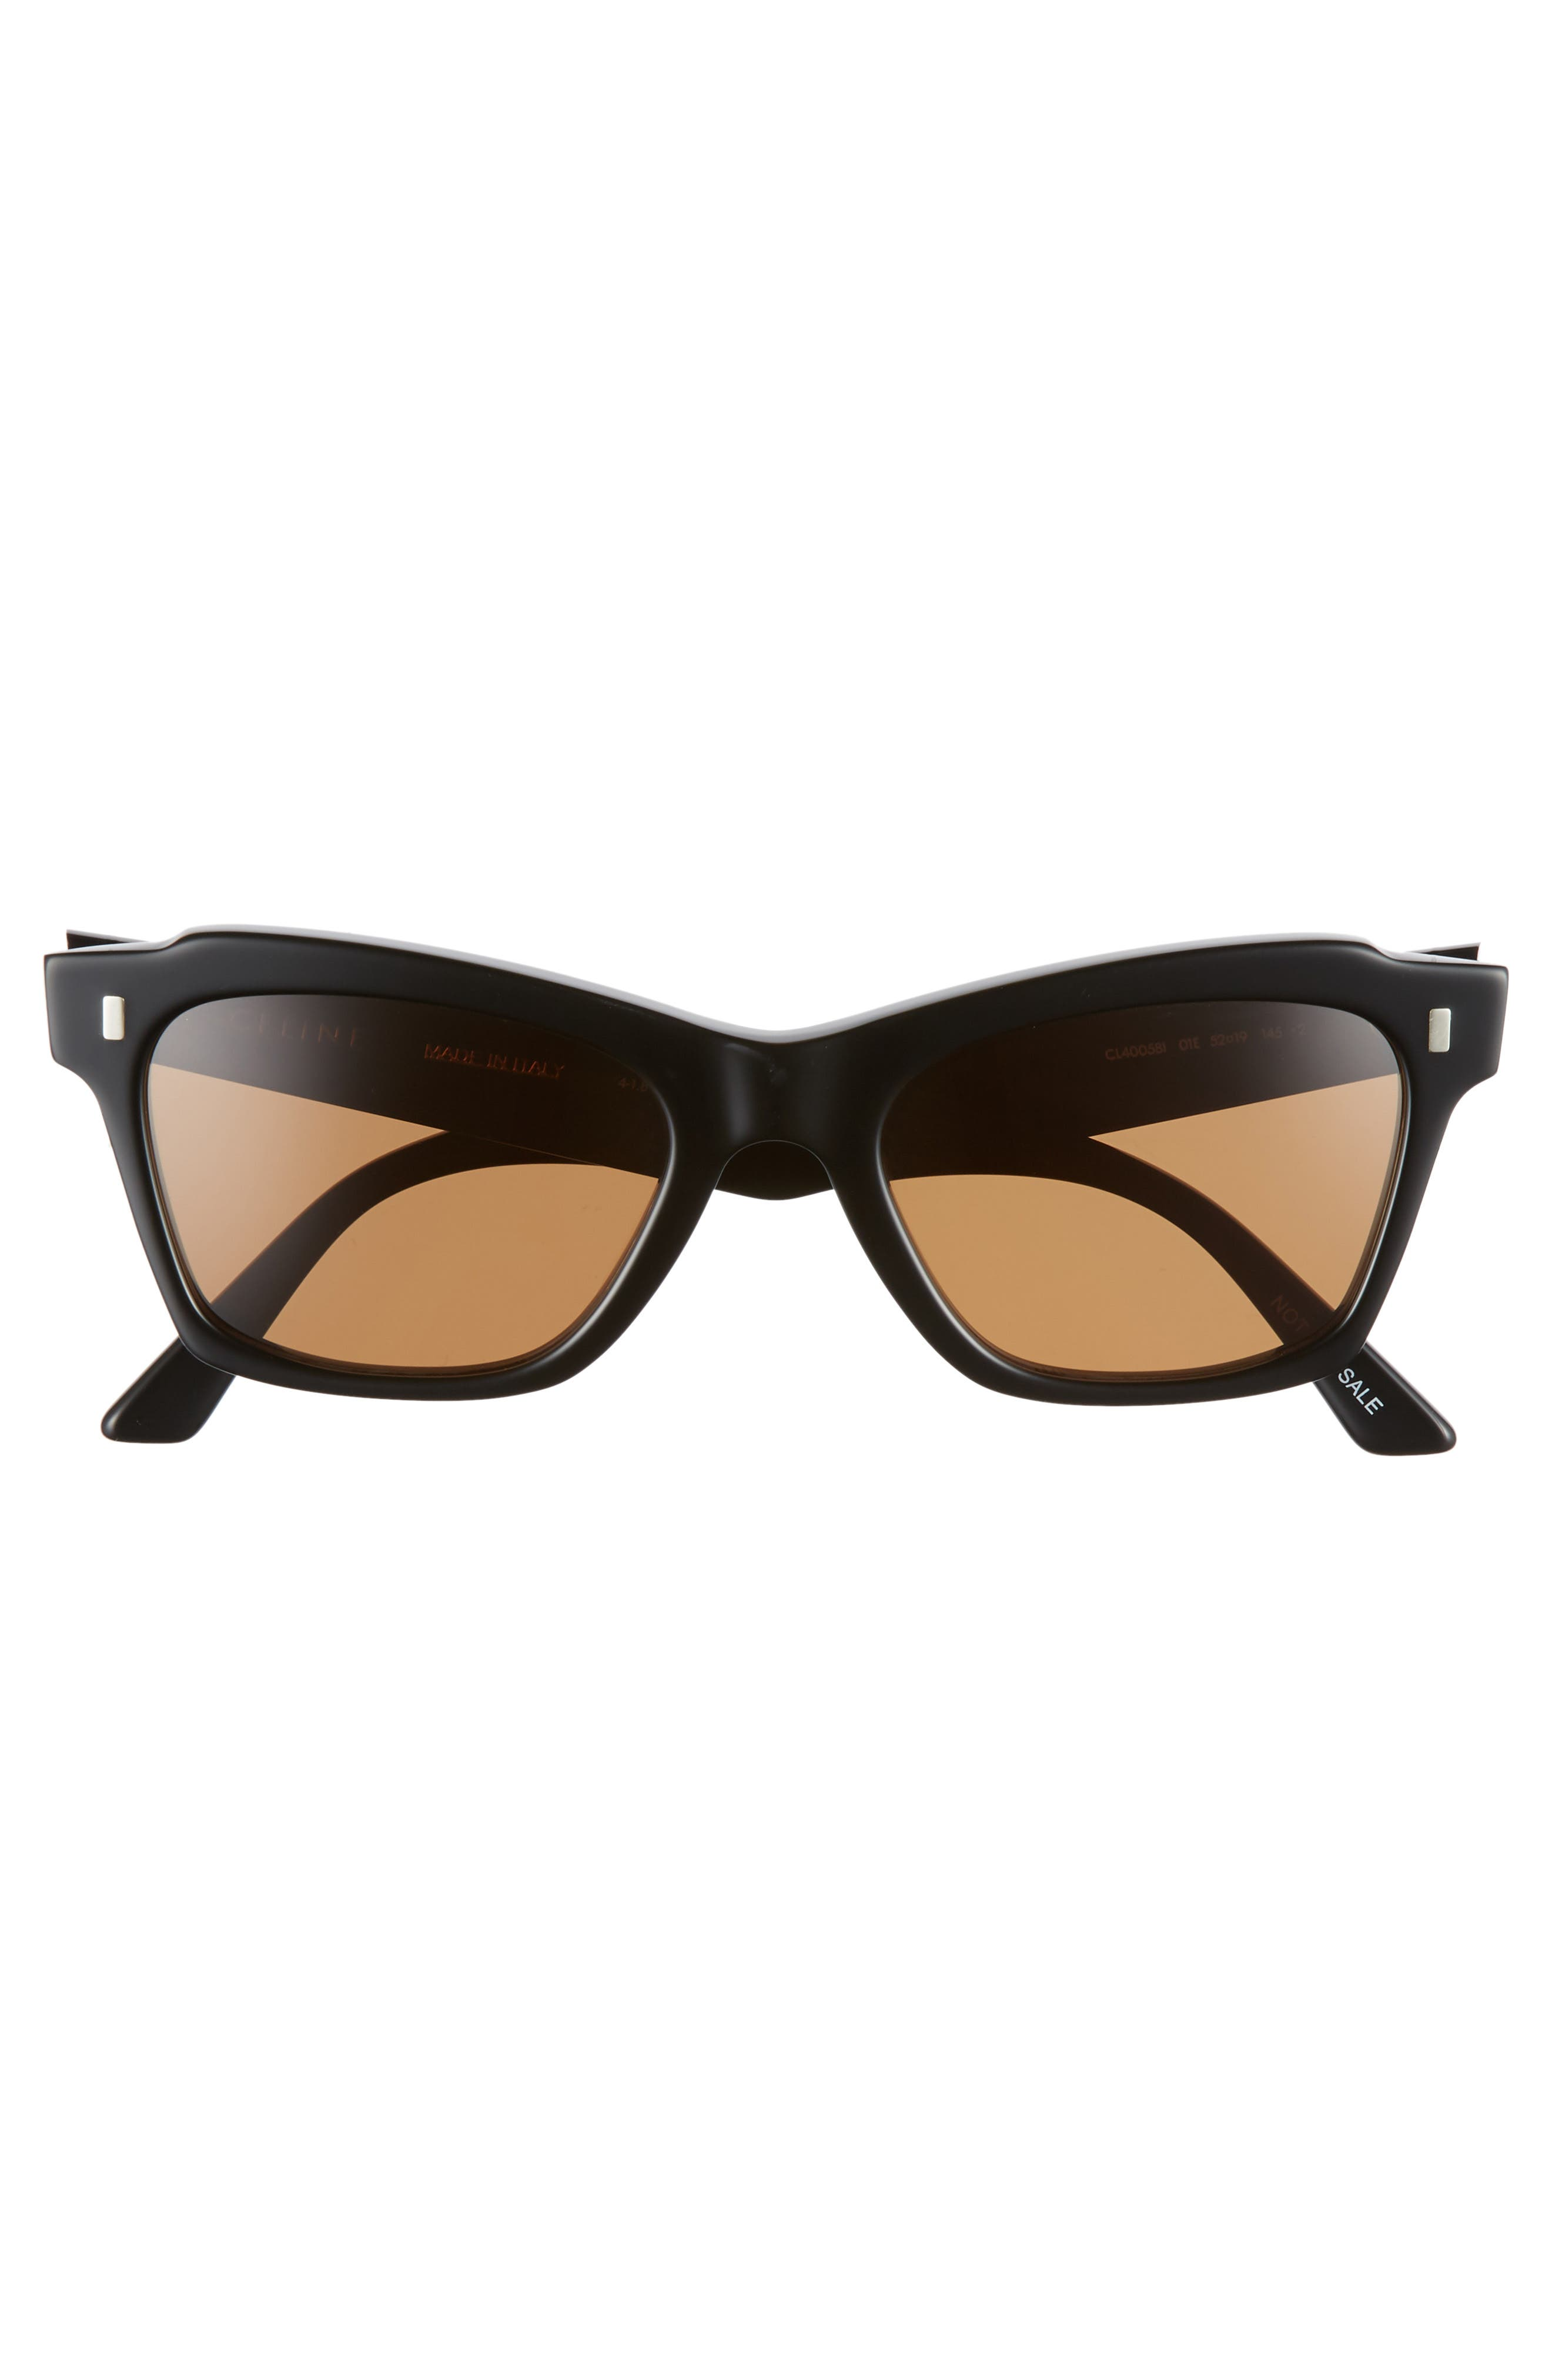 52mm Rectangle Cat Eye Sunglasses,                             Alternate thumbnail 3, color,                             BLACK